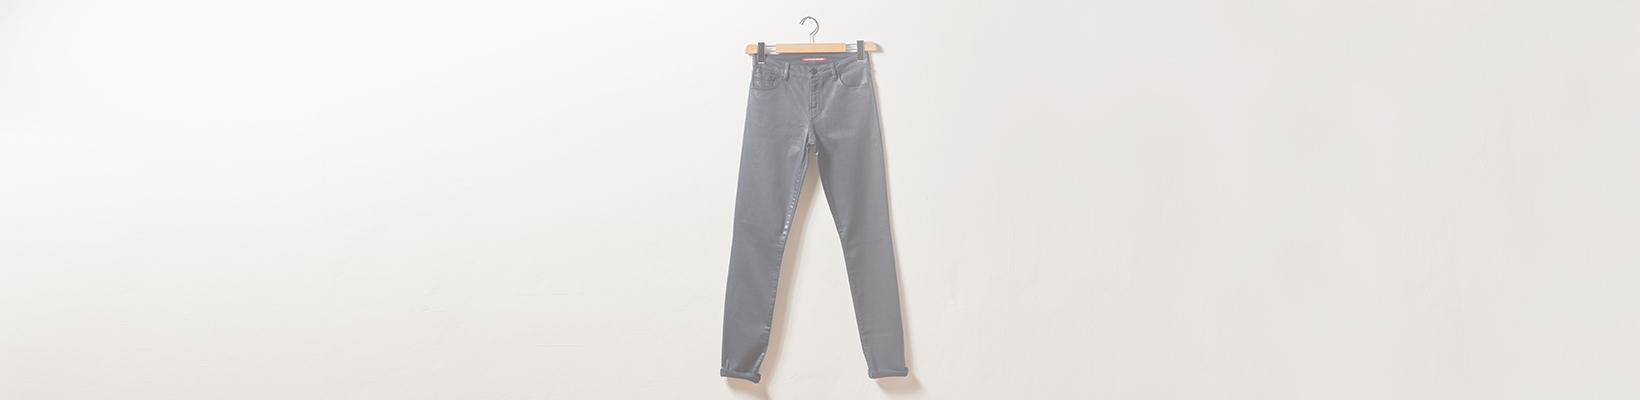 Jeans Skinny pour femmes